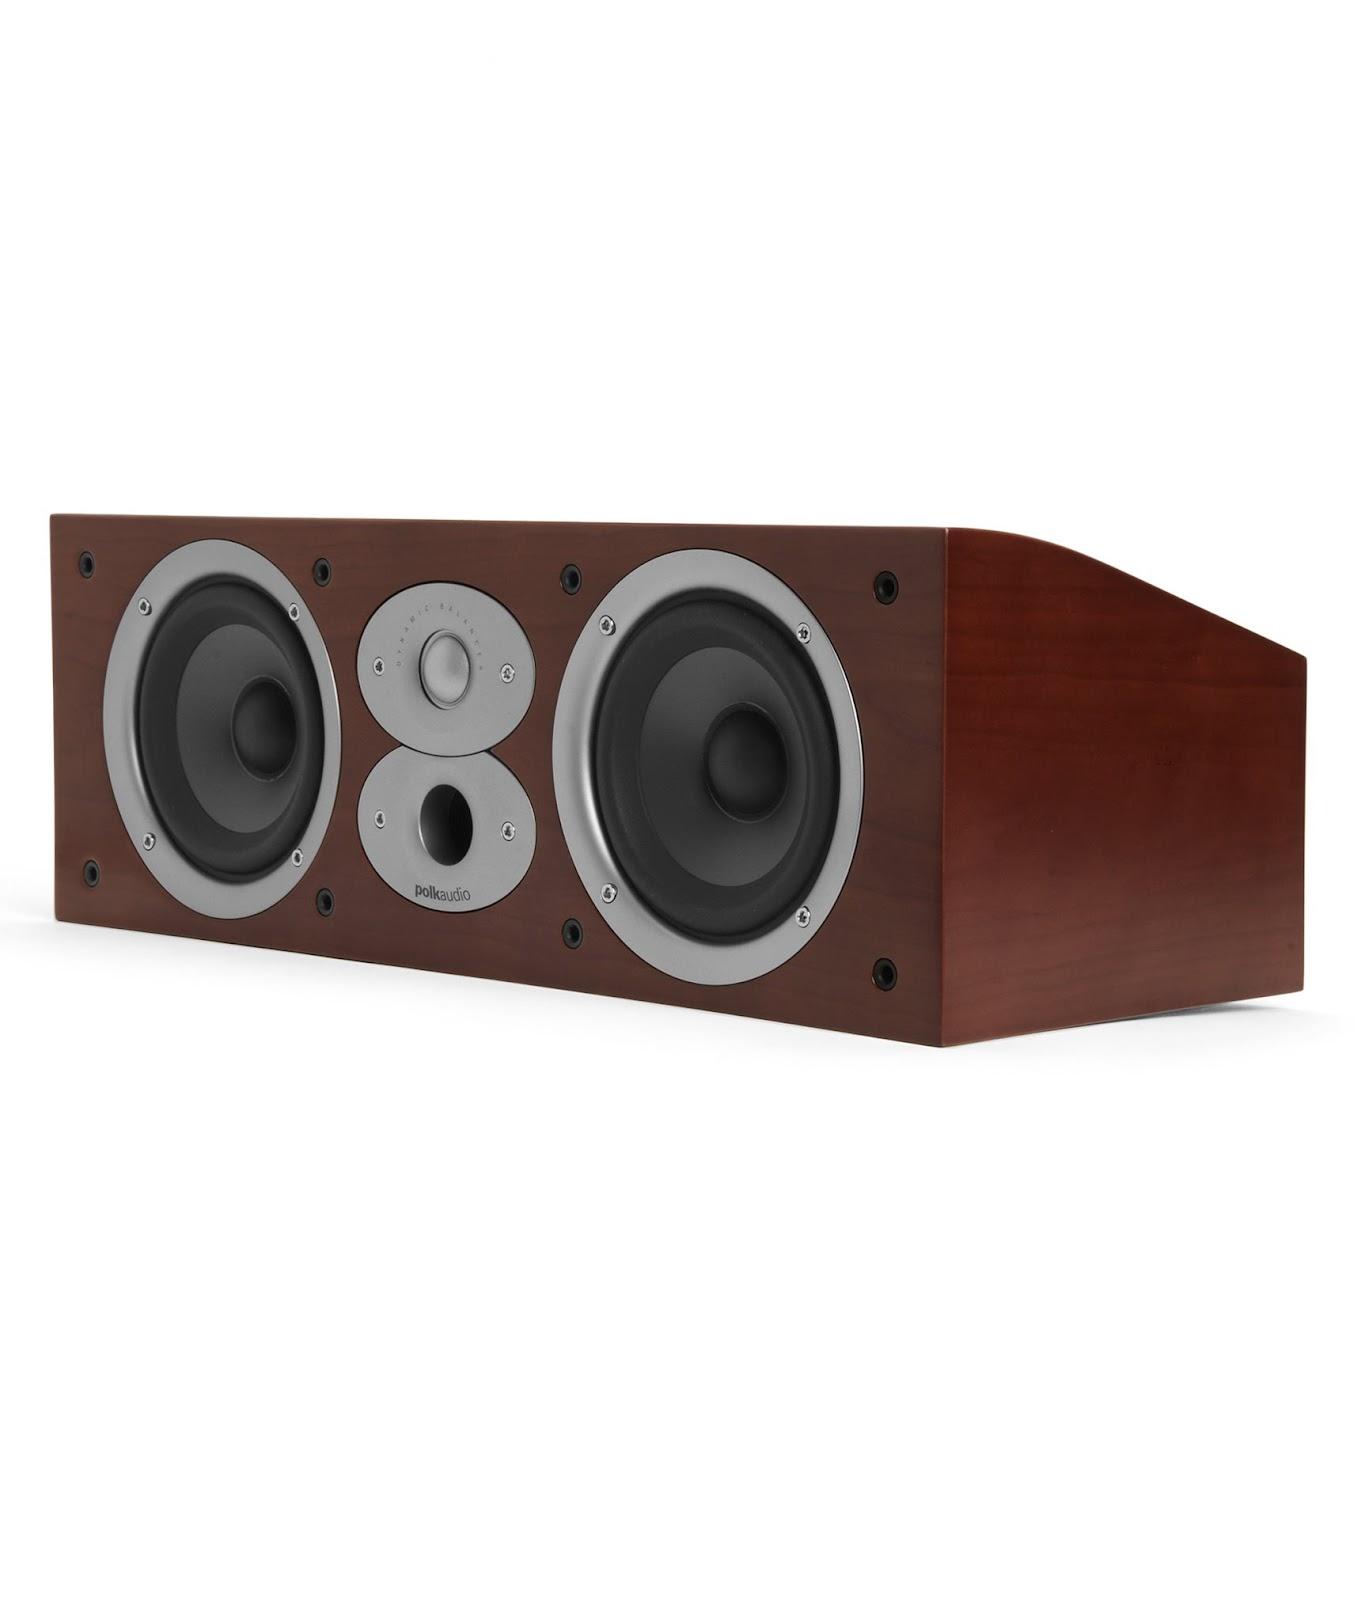 Amply Denon X1600H + Bộ Loa Polk Audio A5 rất sang trọng - 5